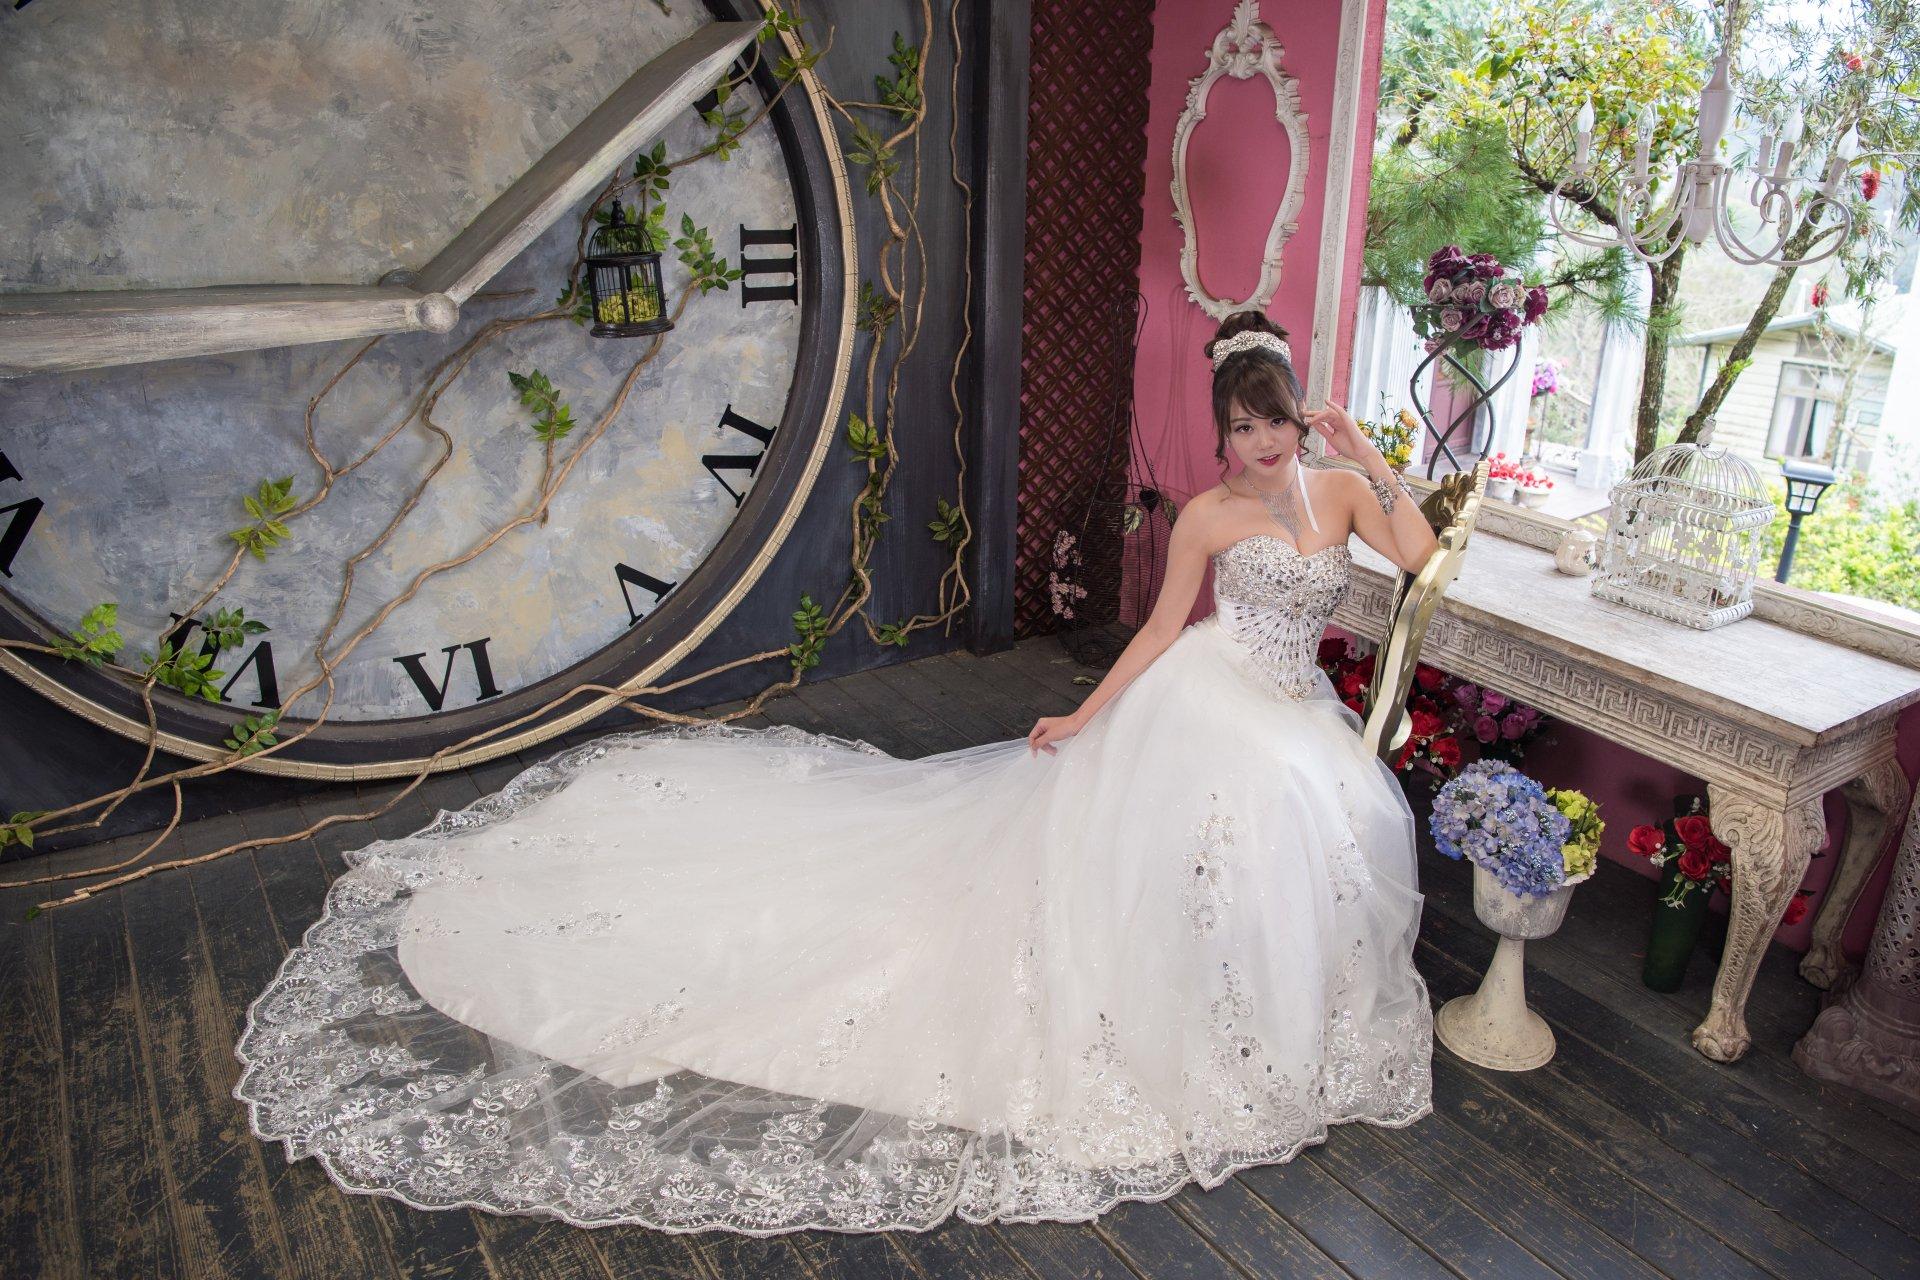 Women - Bride  Woman Oriental Wedding Dress White Dress Clock Brunette Lipstick Brown Eyes Necklace Wallpaper